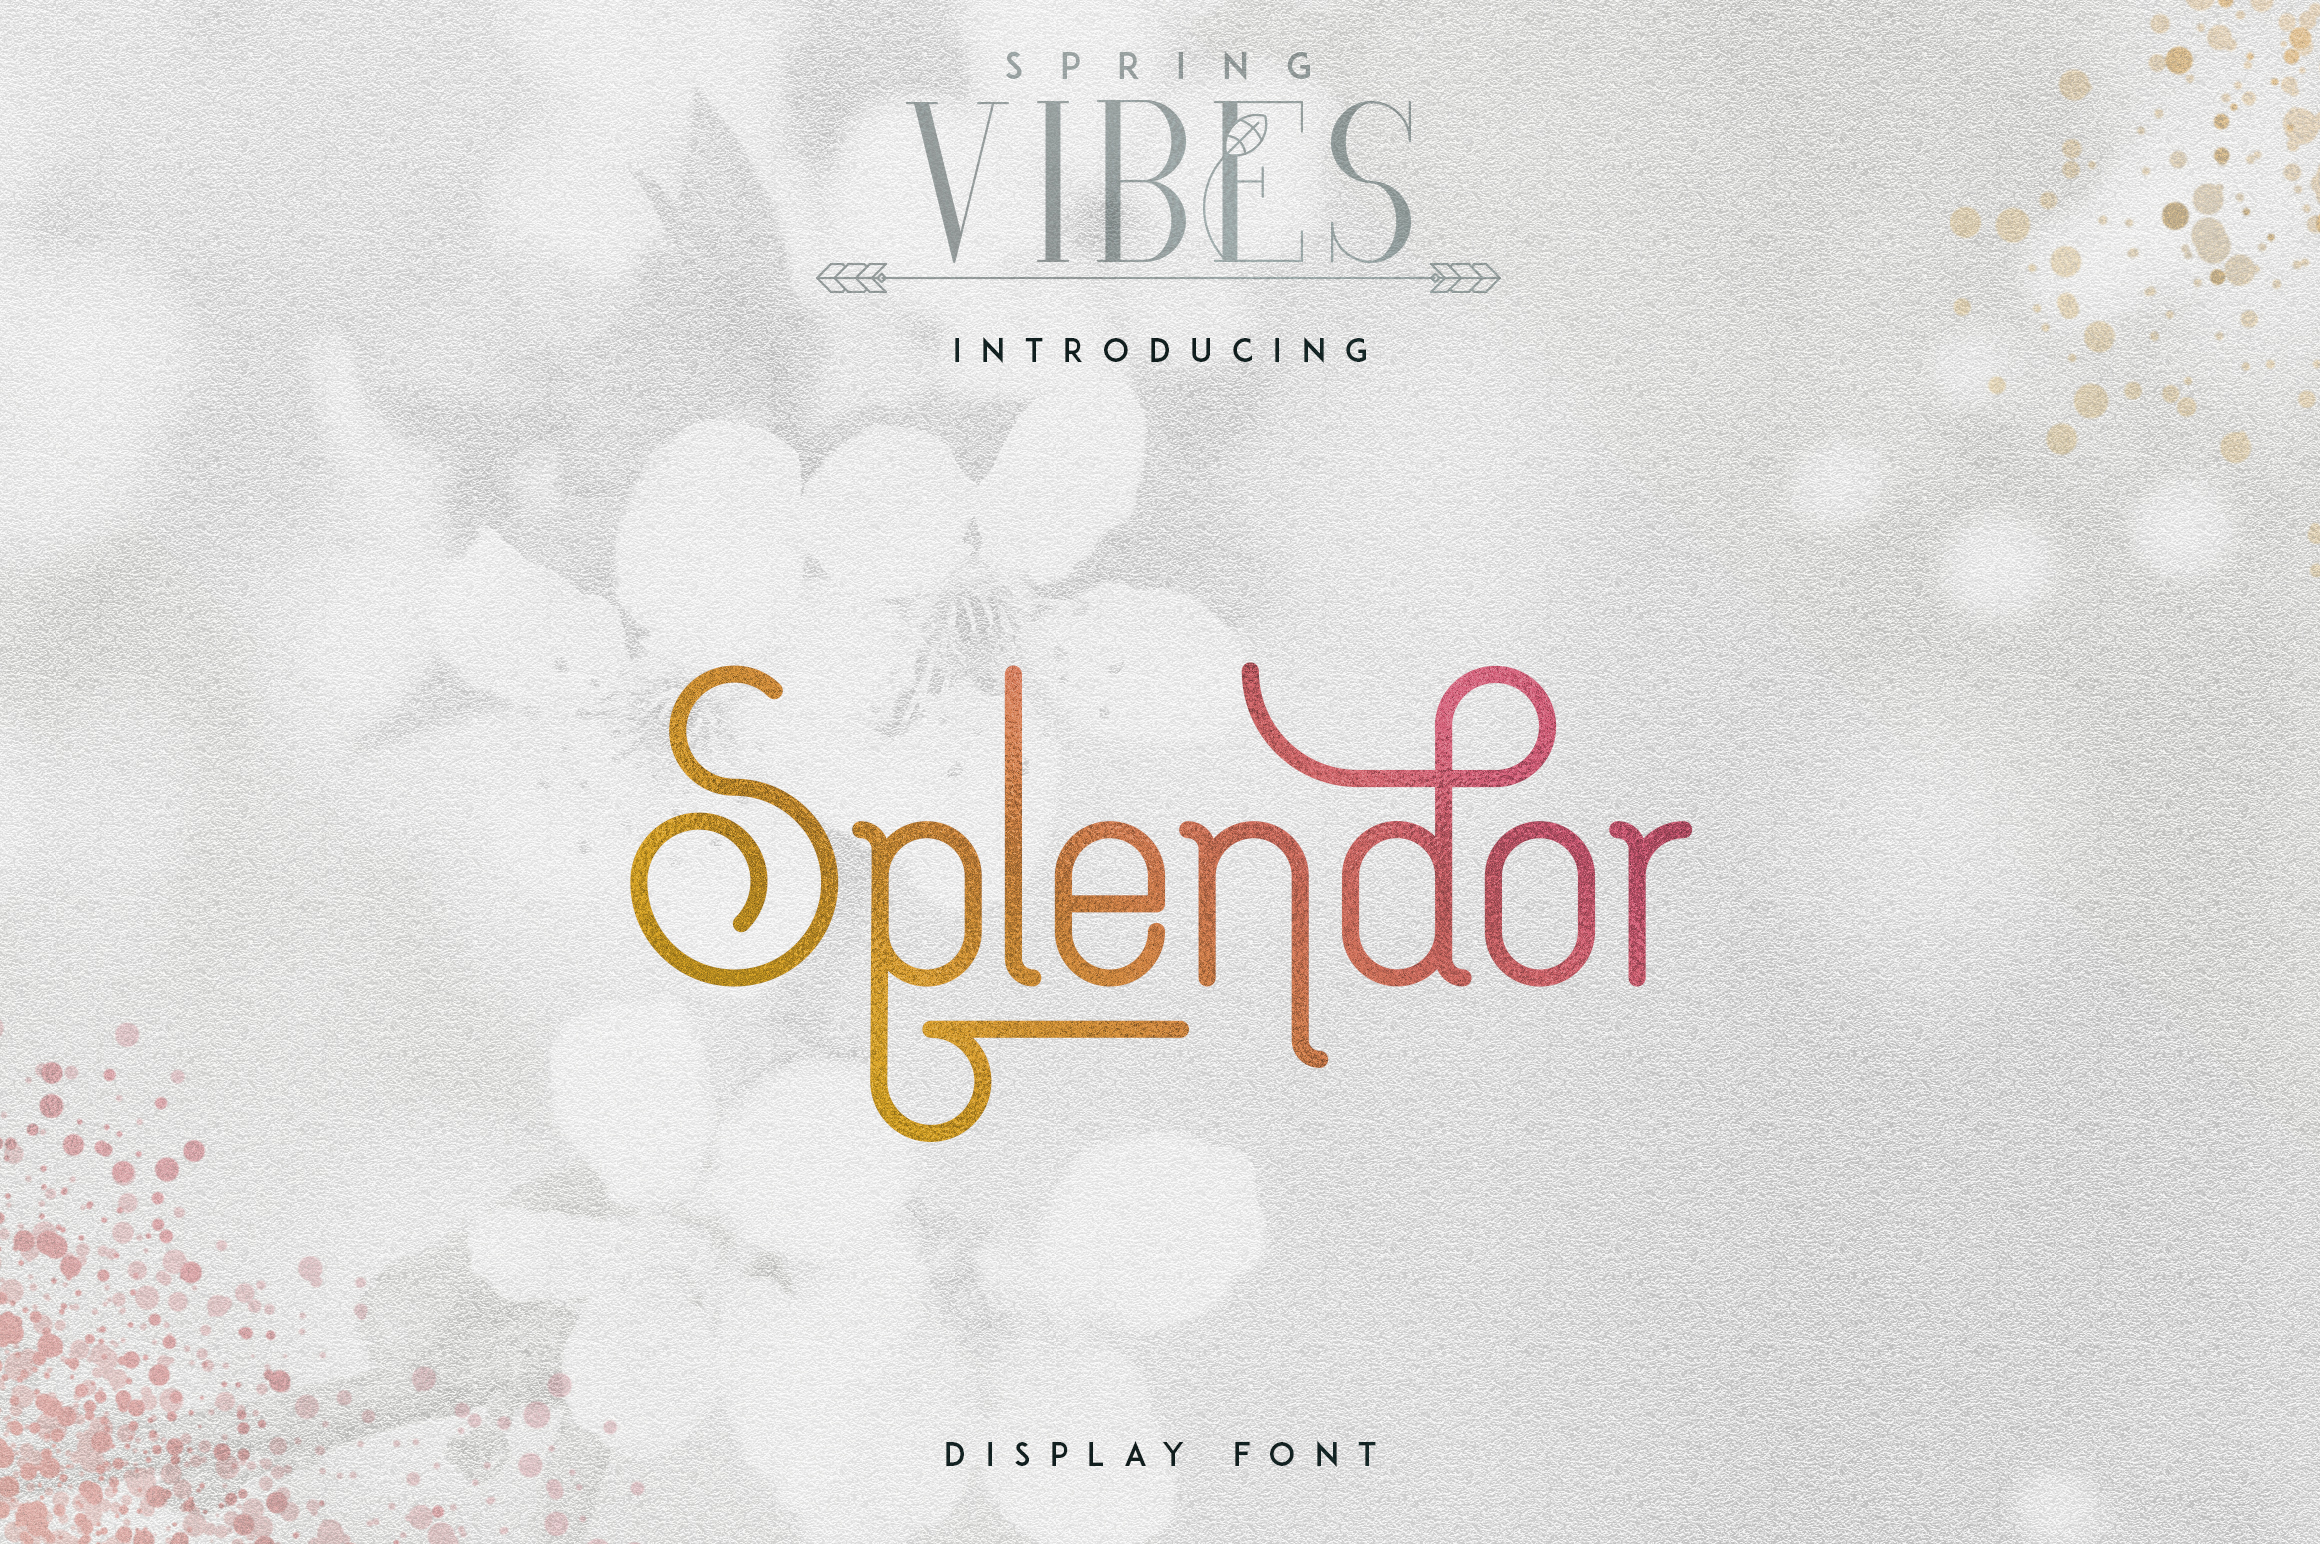 [Spring Vibes] Splendor Font example image 1